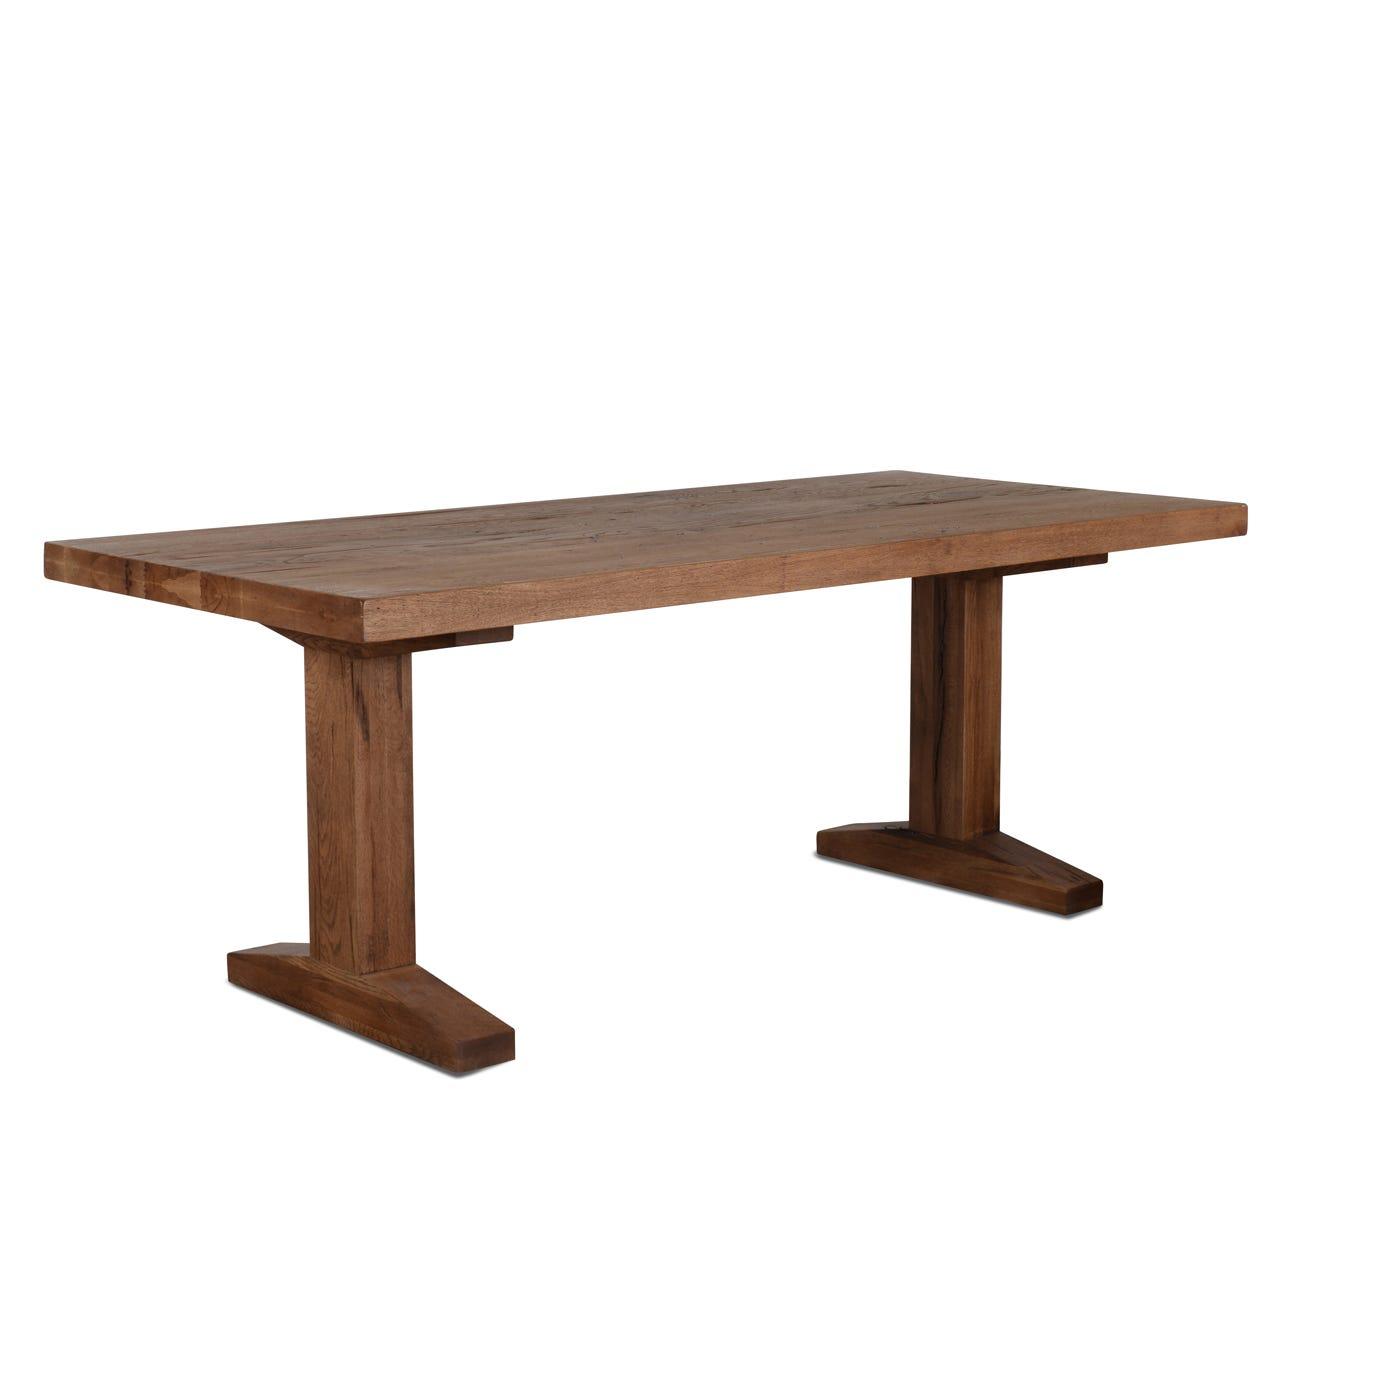 Tuscan Rustic Antique Wild Oak Table 220 x100